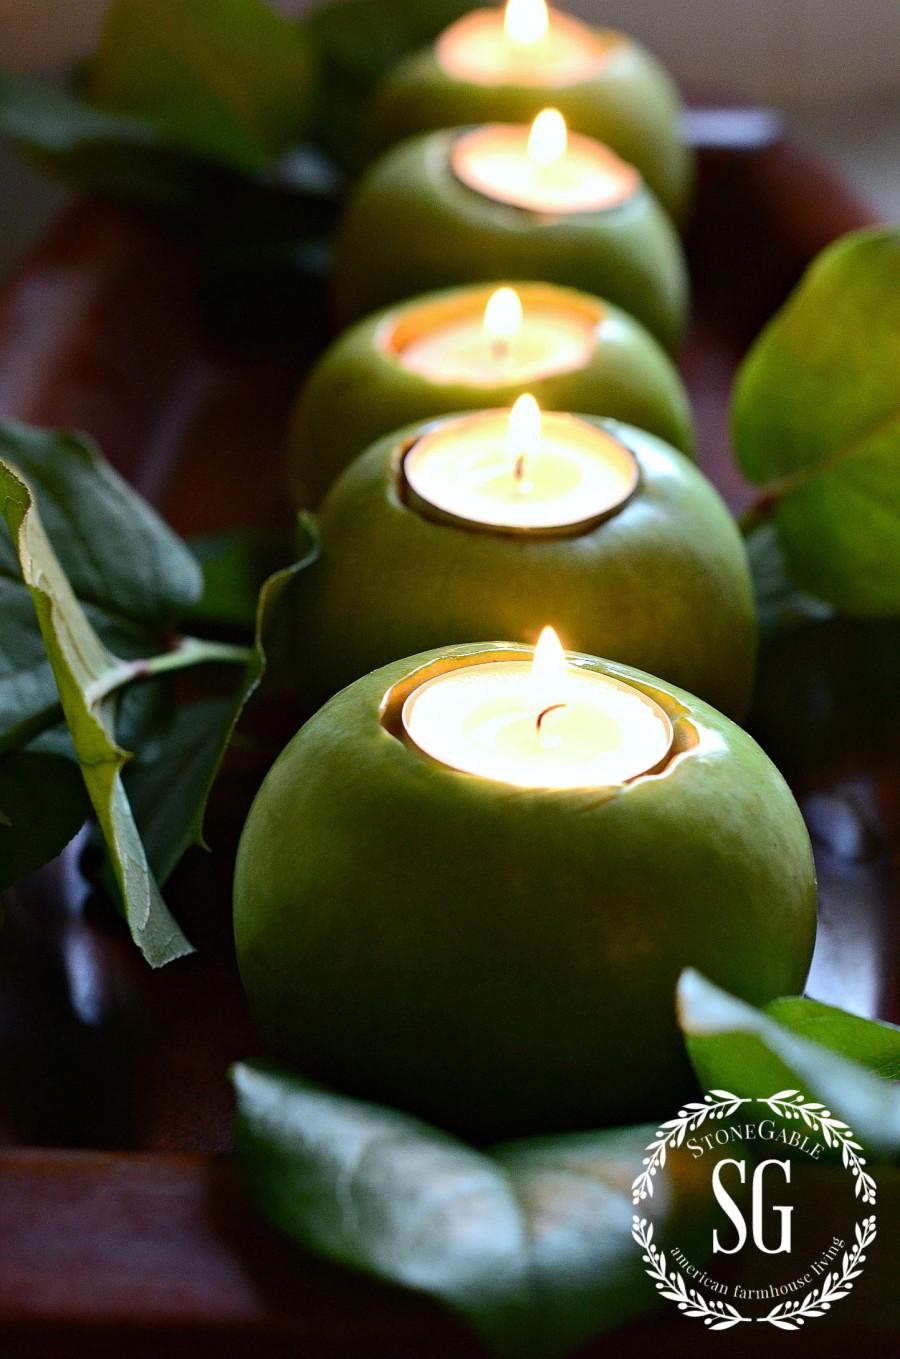 GREEN APPLE CENTERPIECE-apples in a row-stonegableblog.com